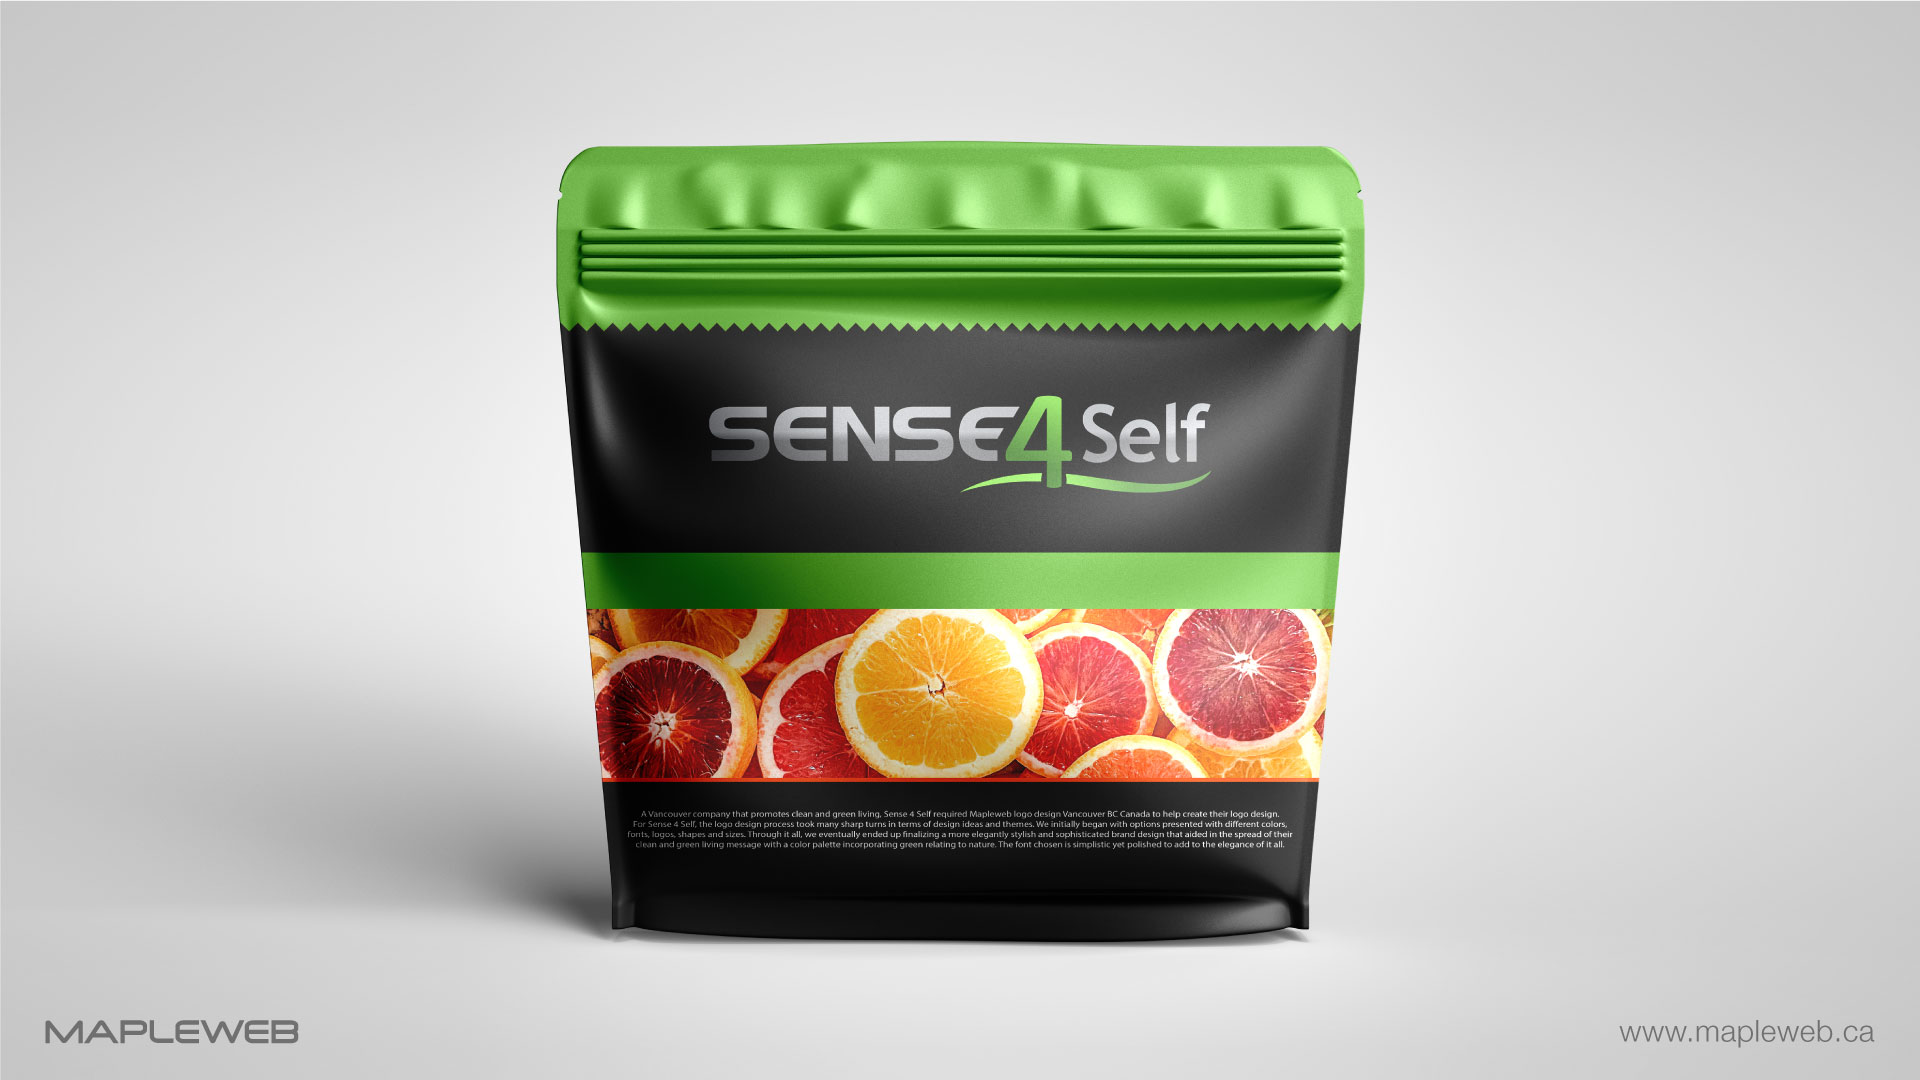 sense-4-self-brand-logo-design-by-mapleweb-vancouver-canada-organic-cold-drink-mock